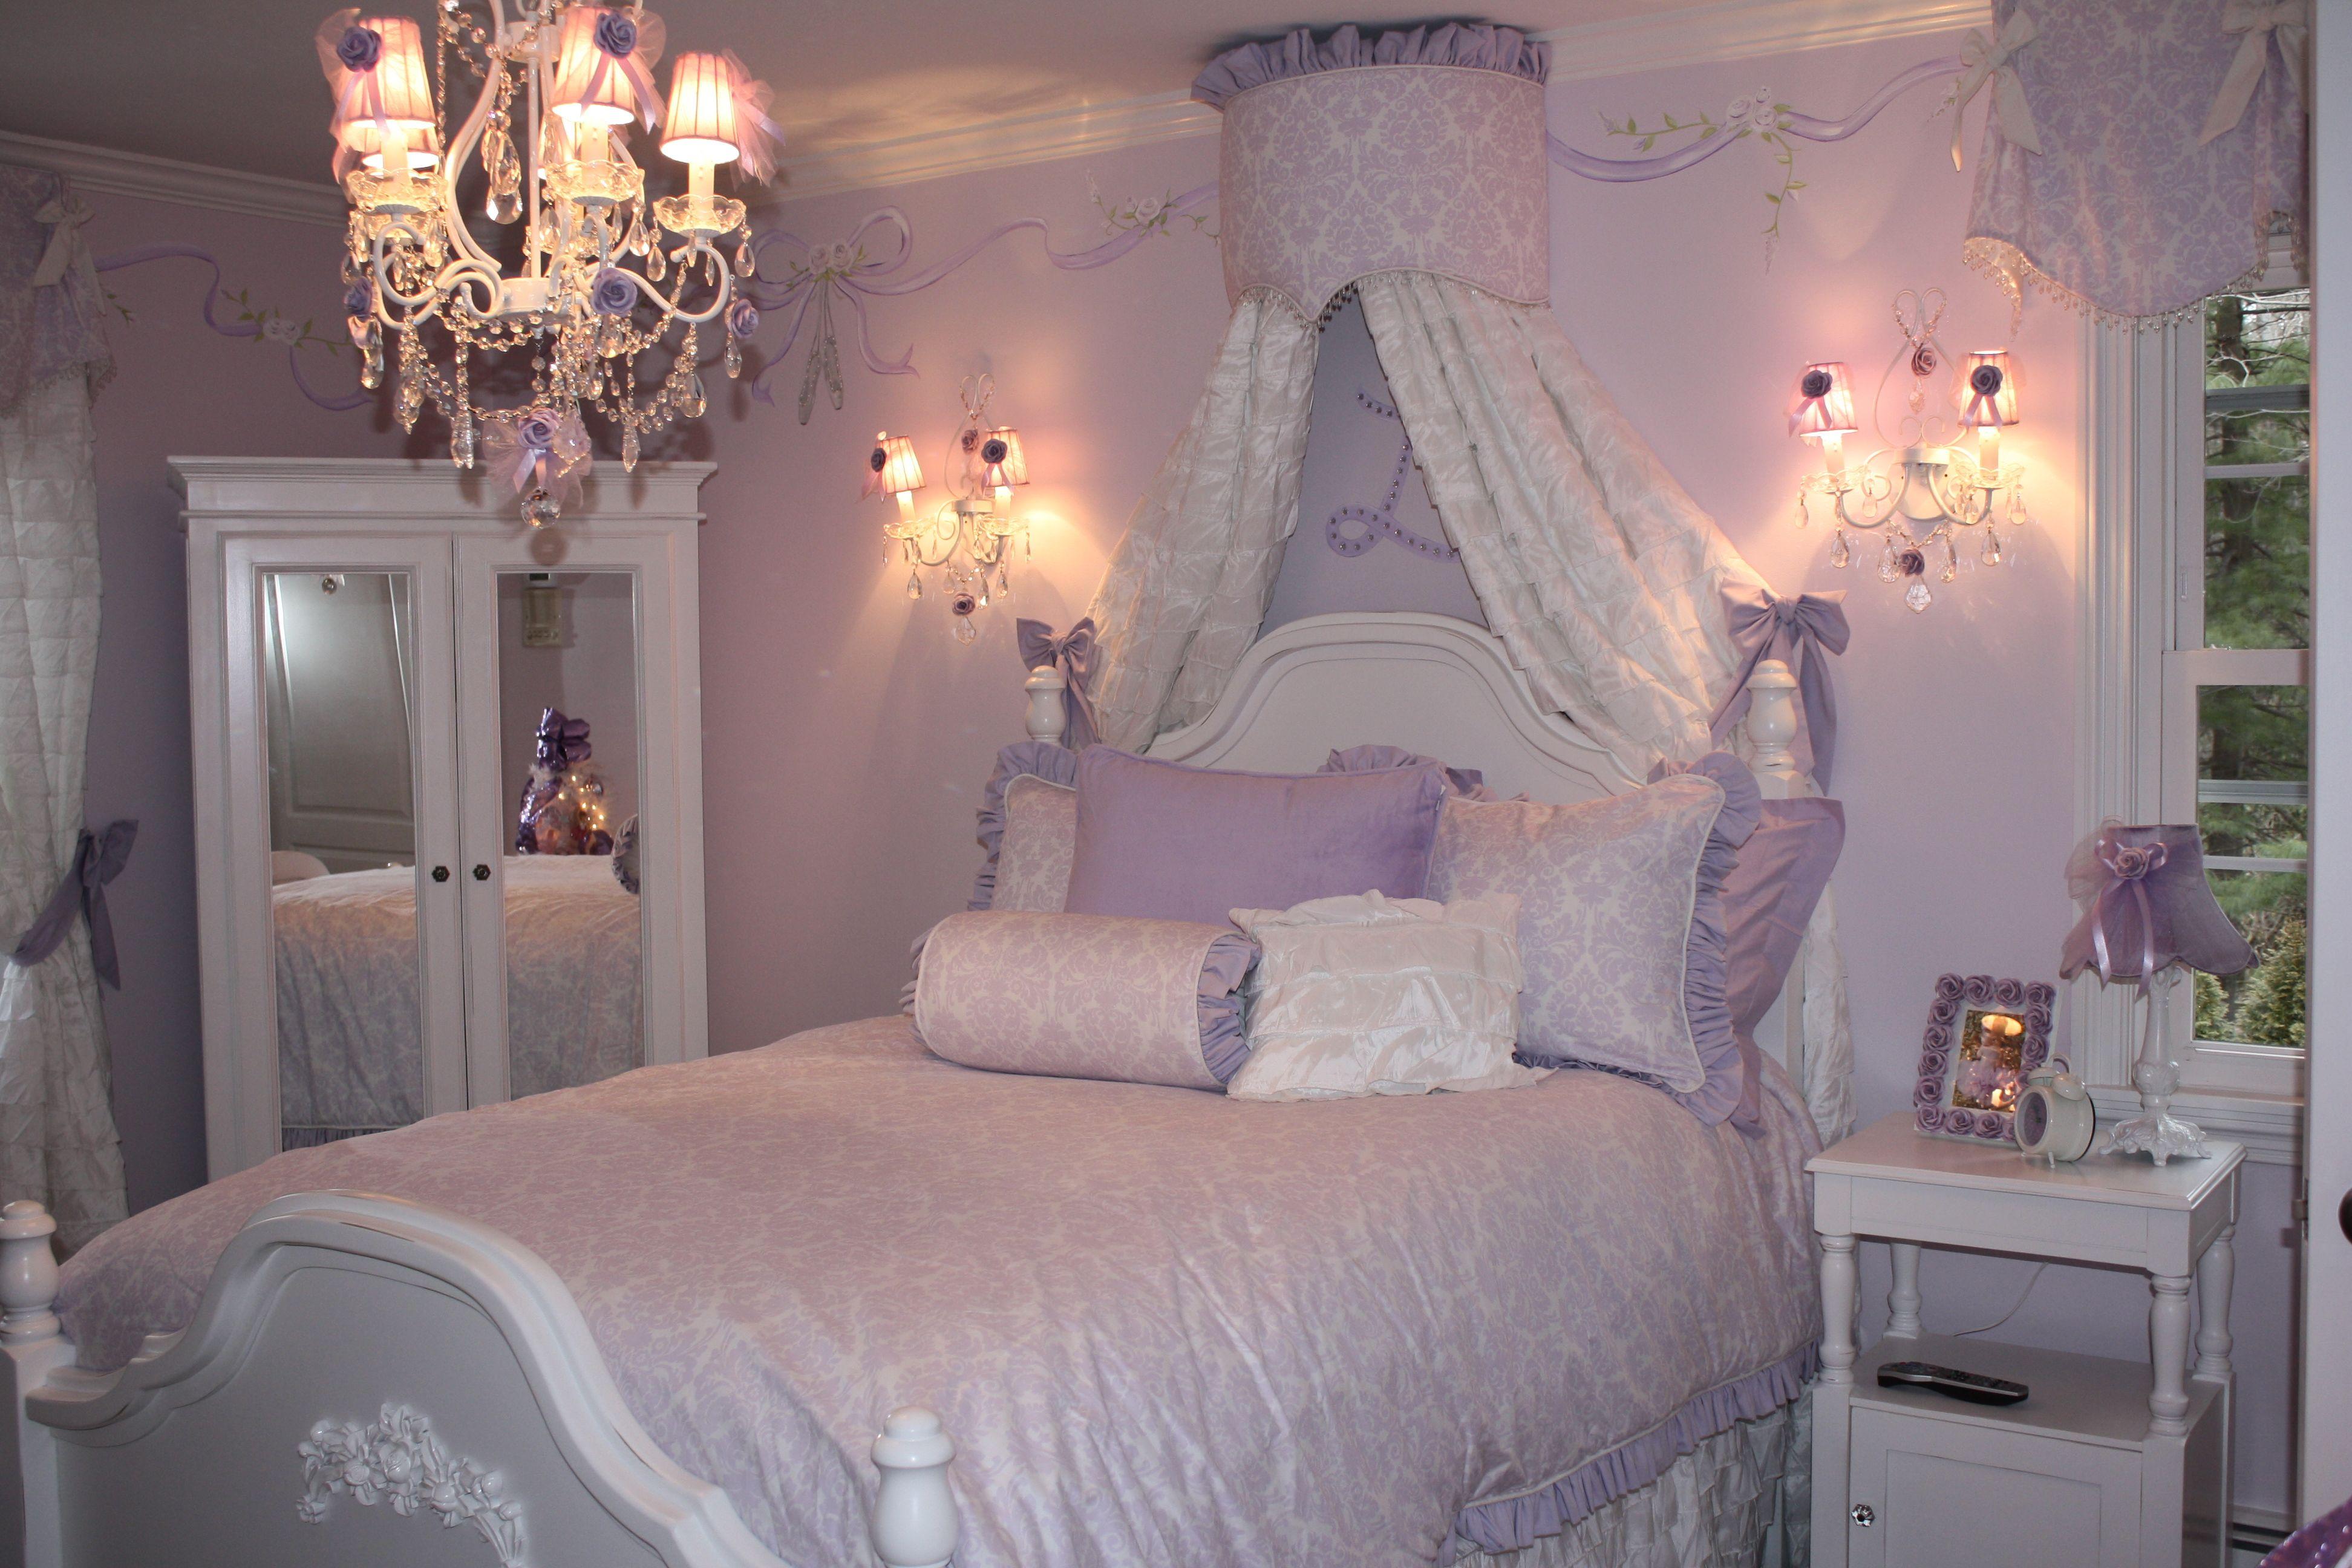 Elegant Ballerina Room Any Girl Would Want